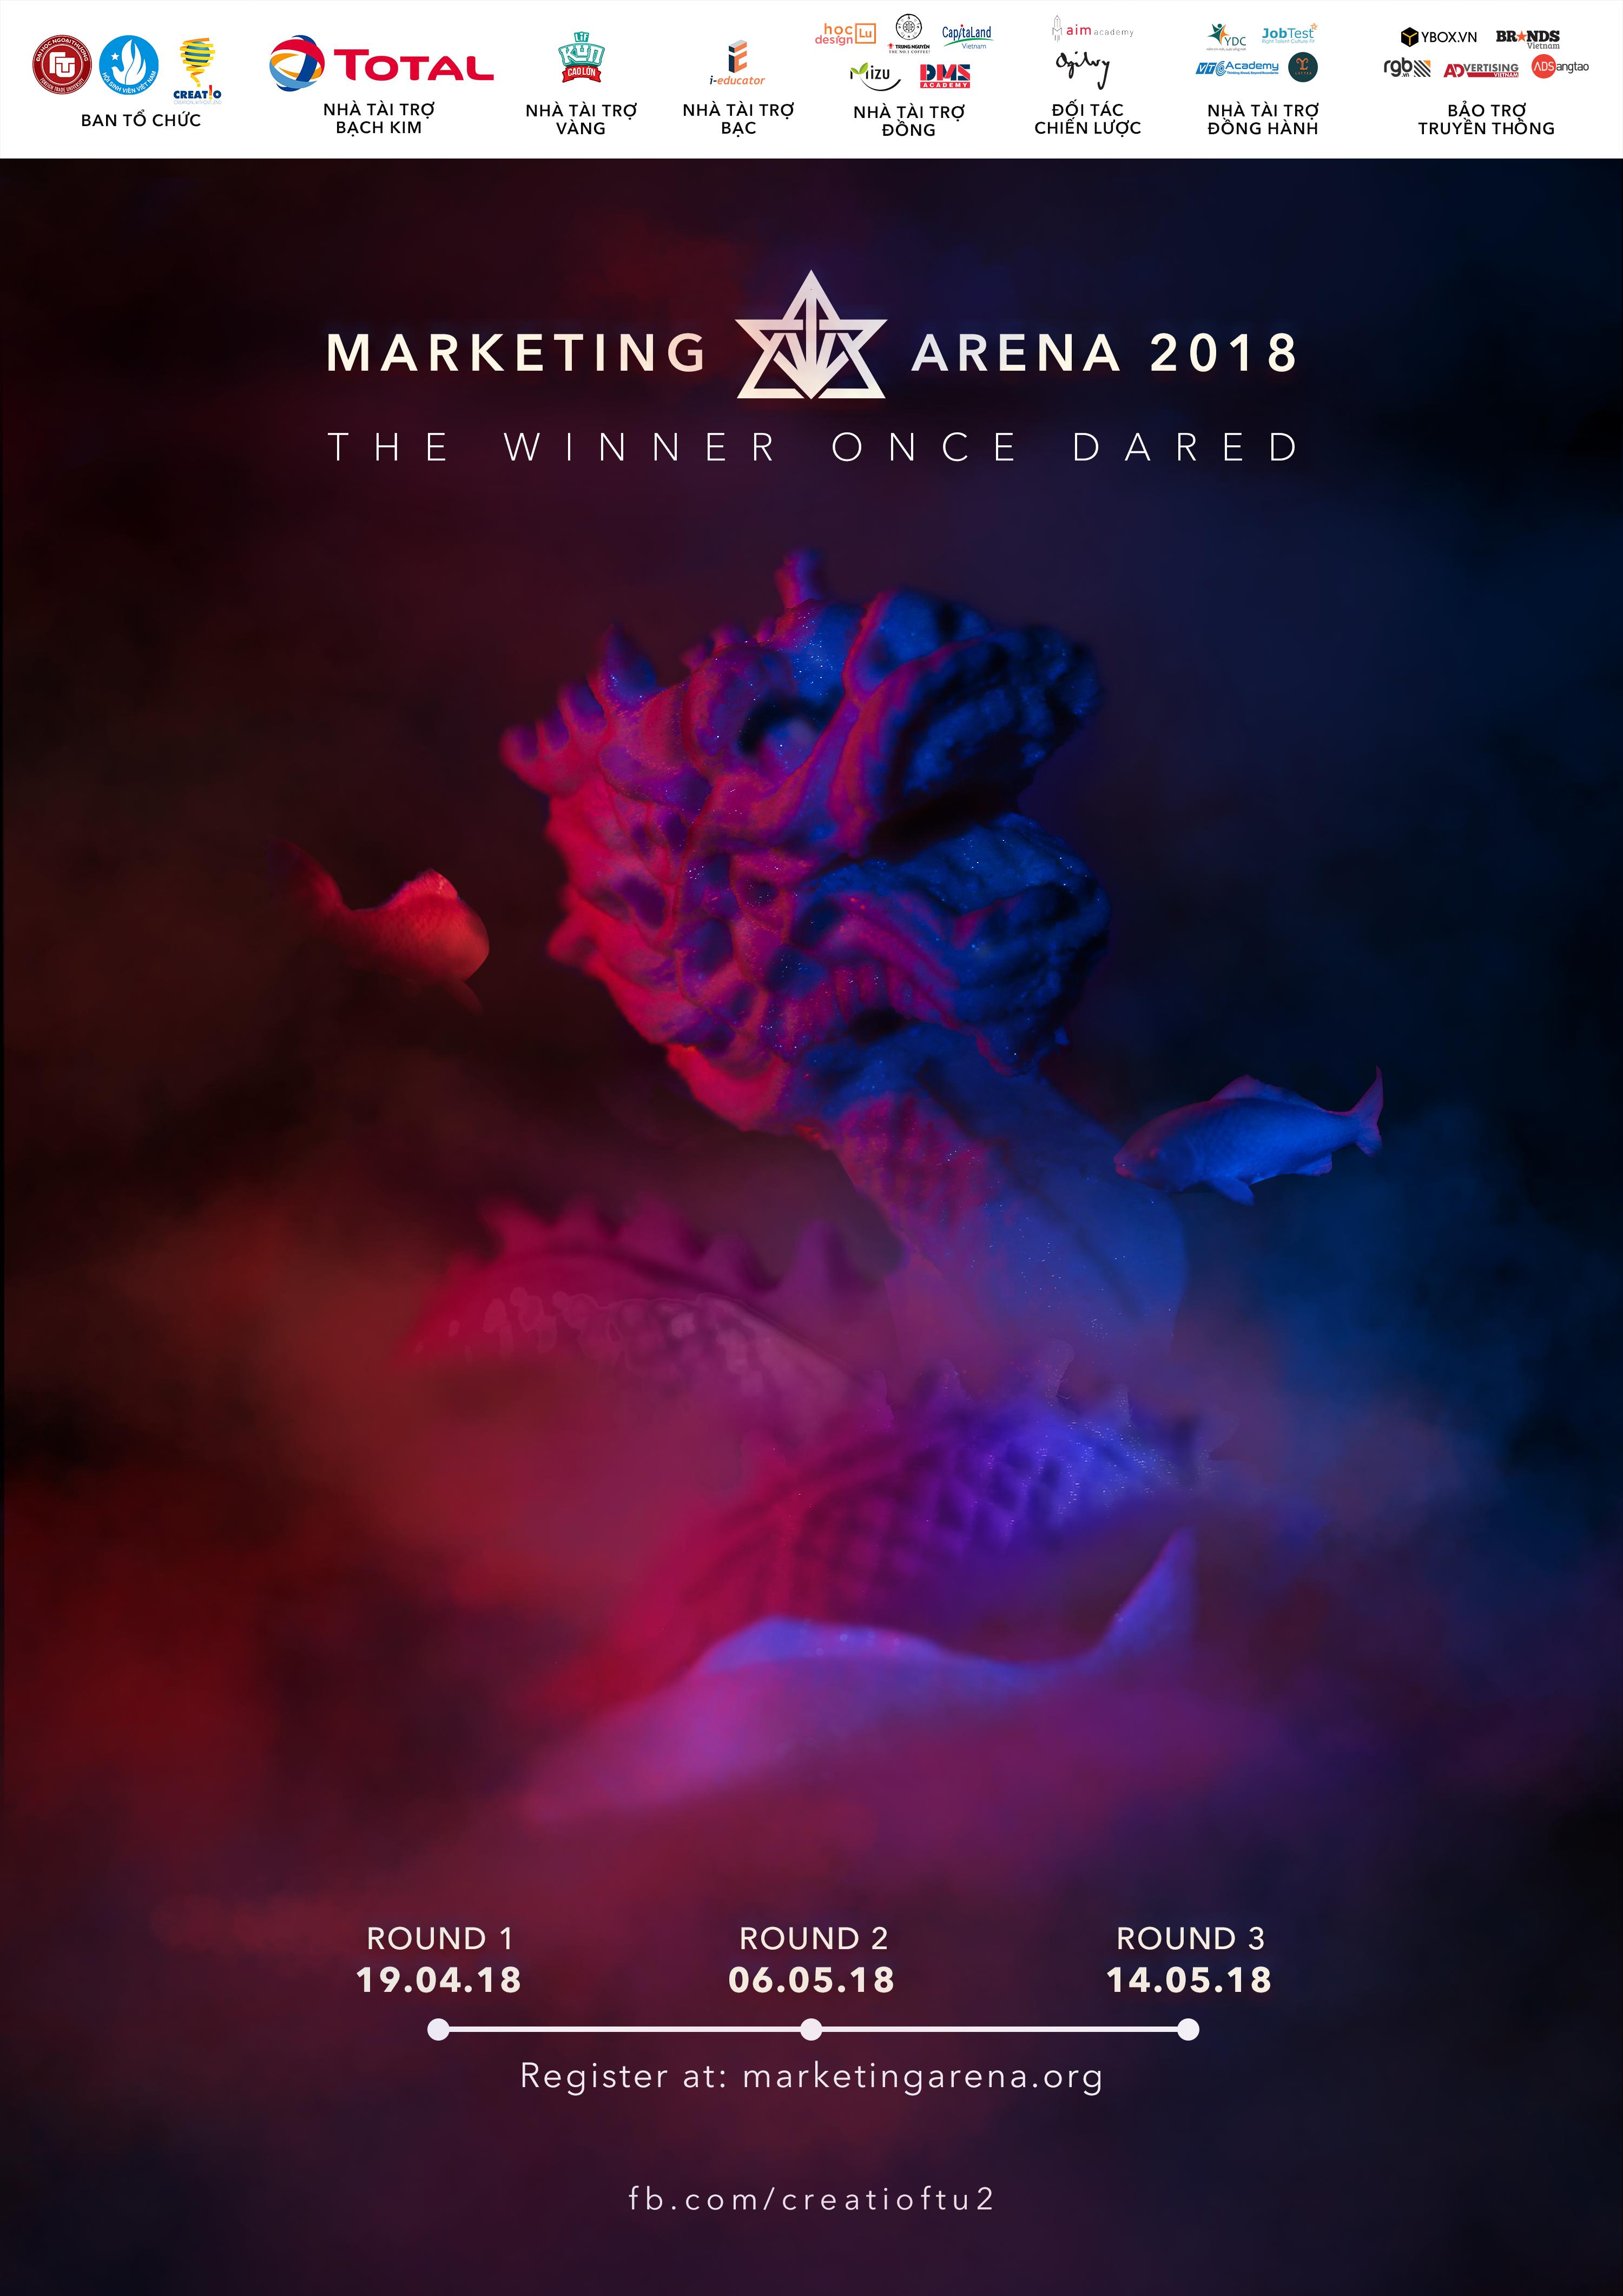 rgb_creative_marketing_arena_contest